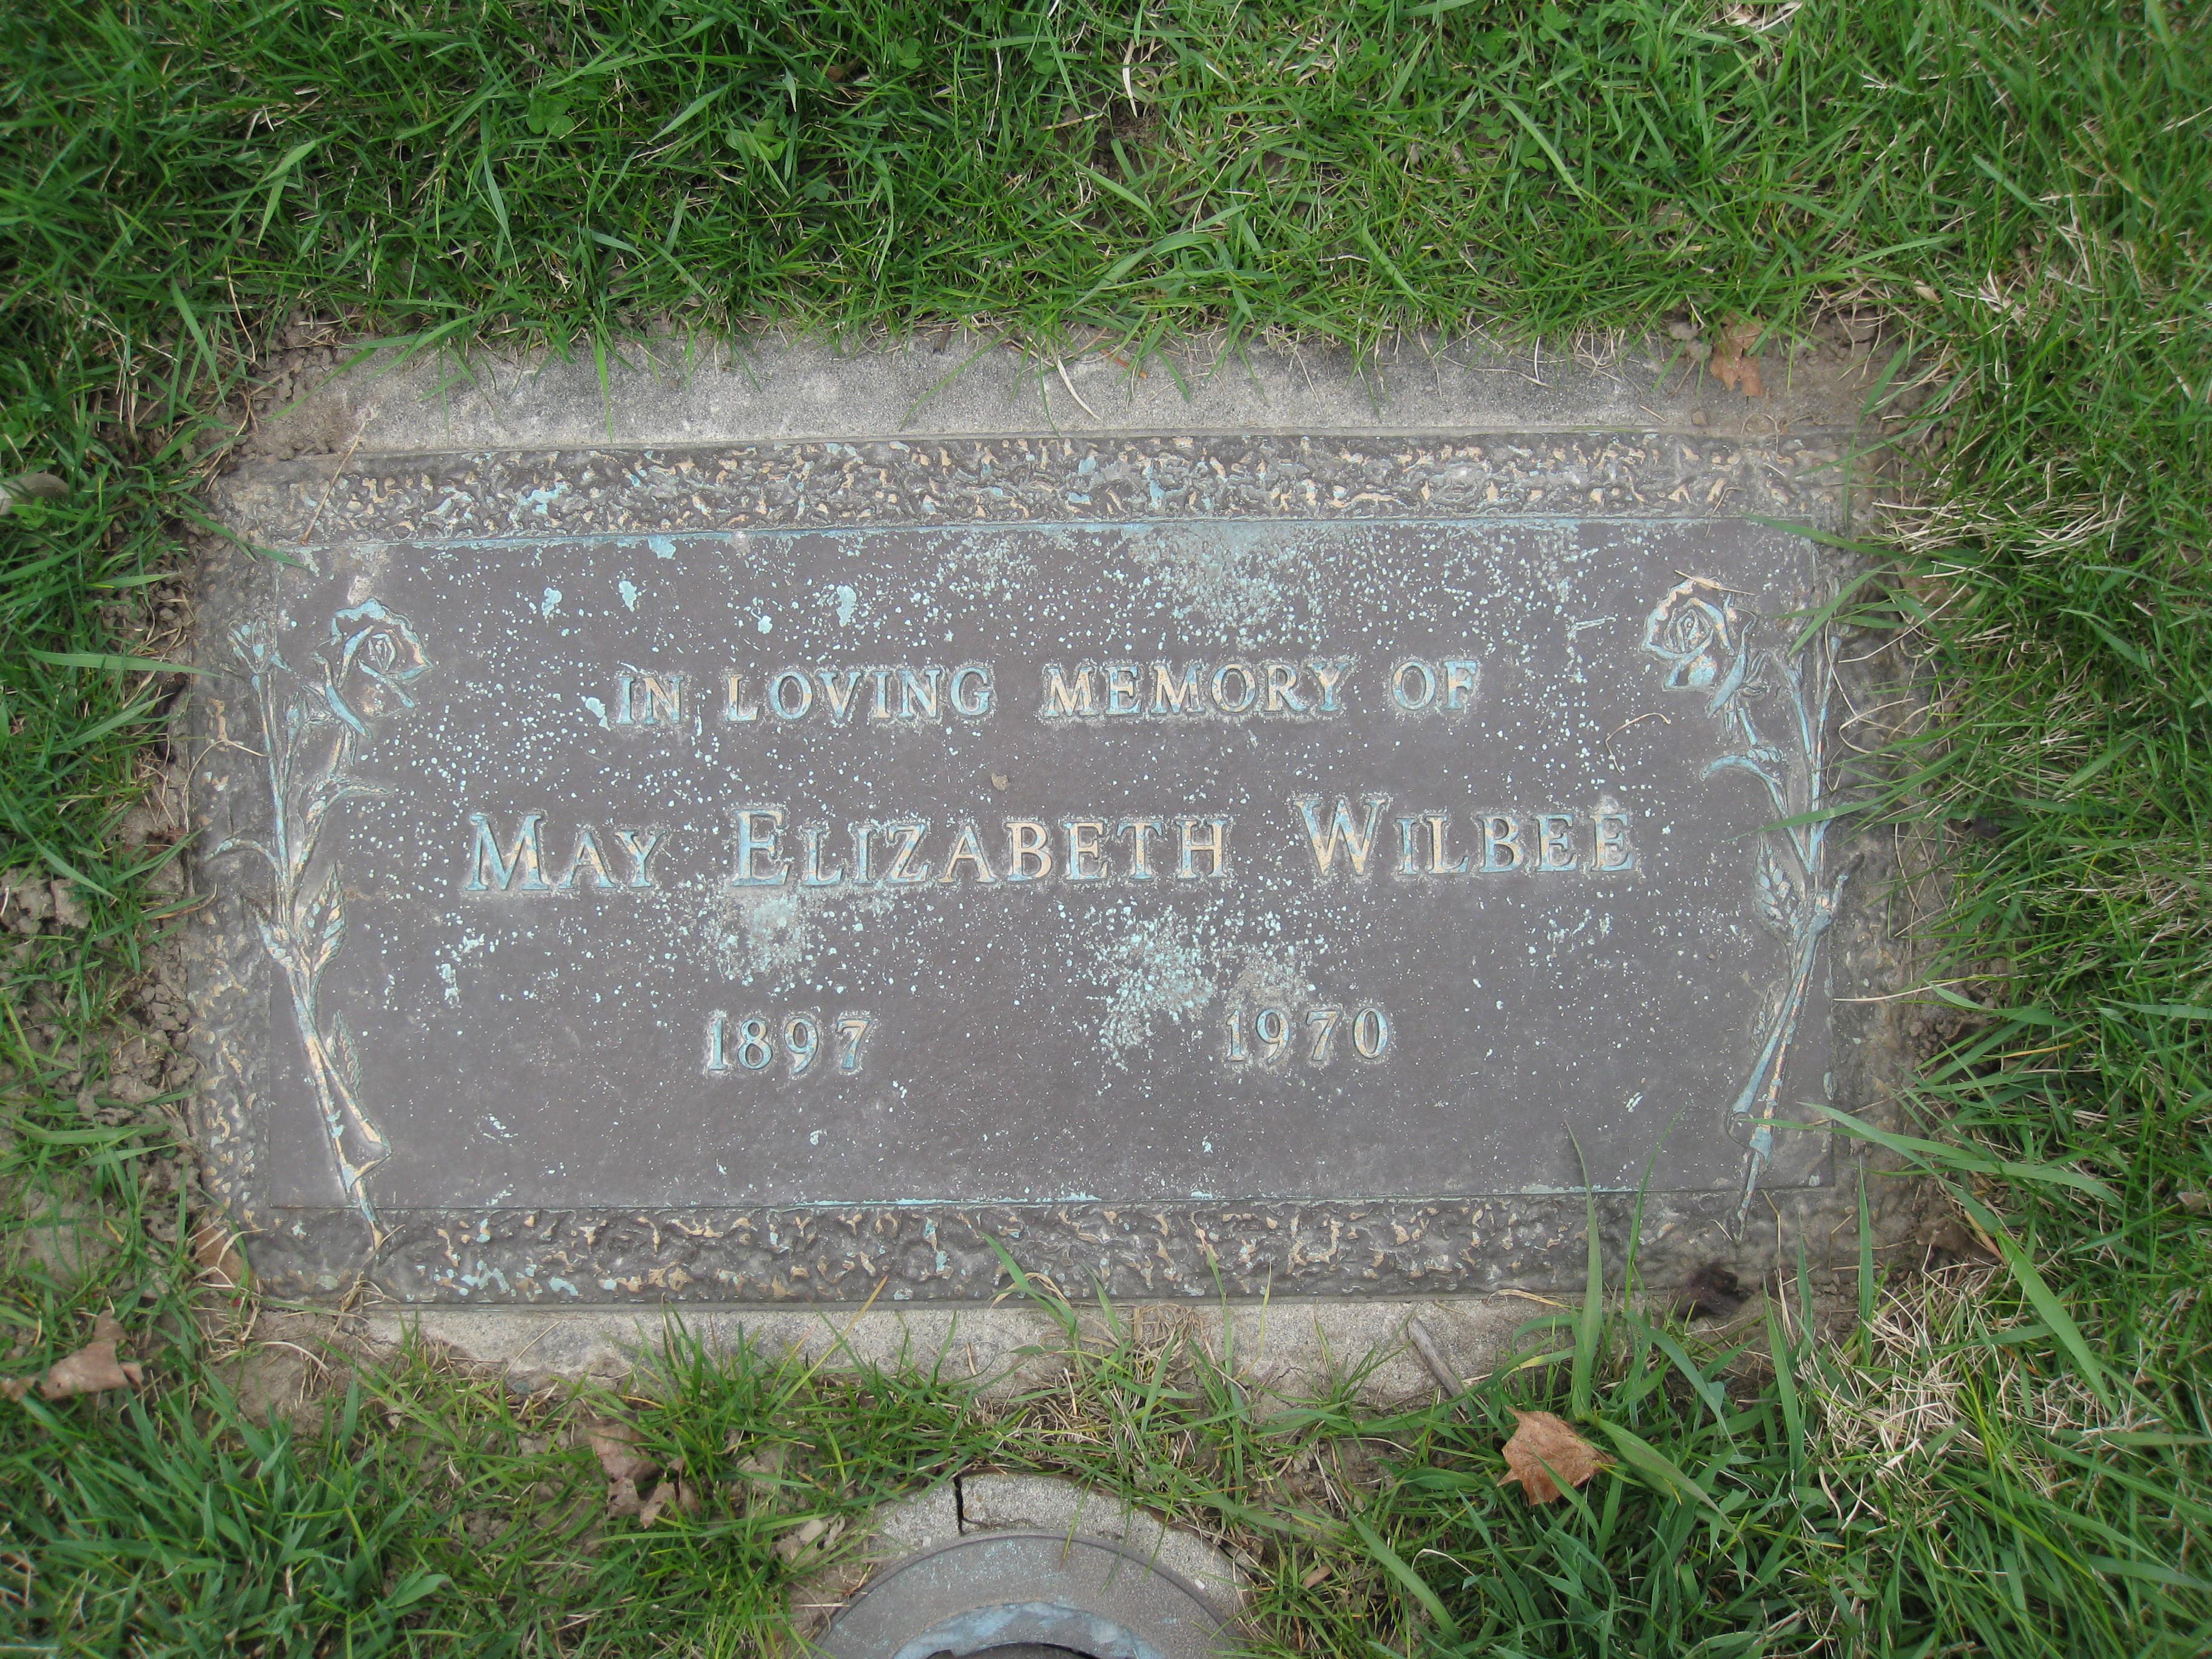 May Elizabeth Brooker